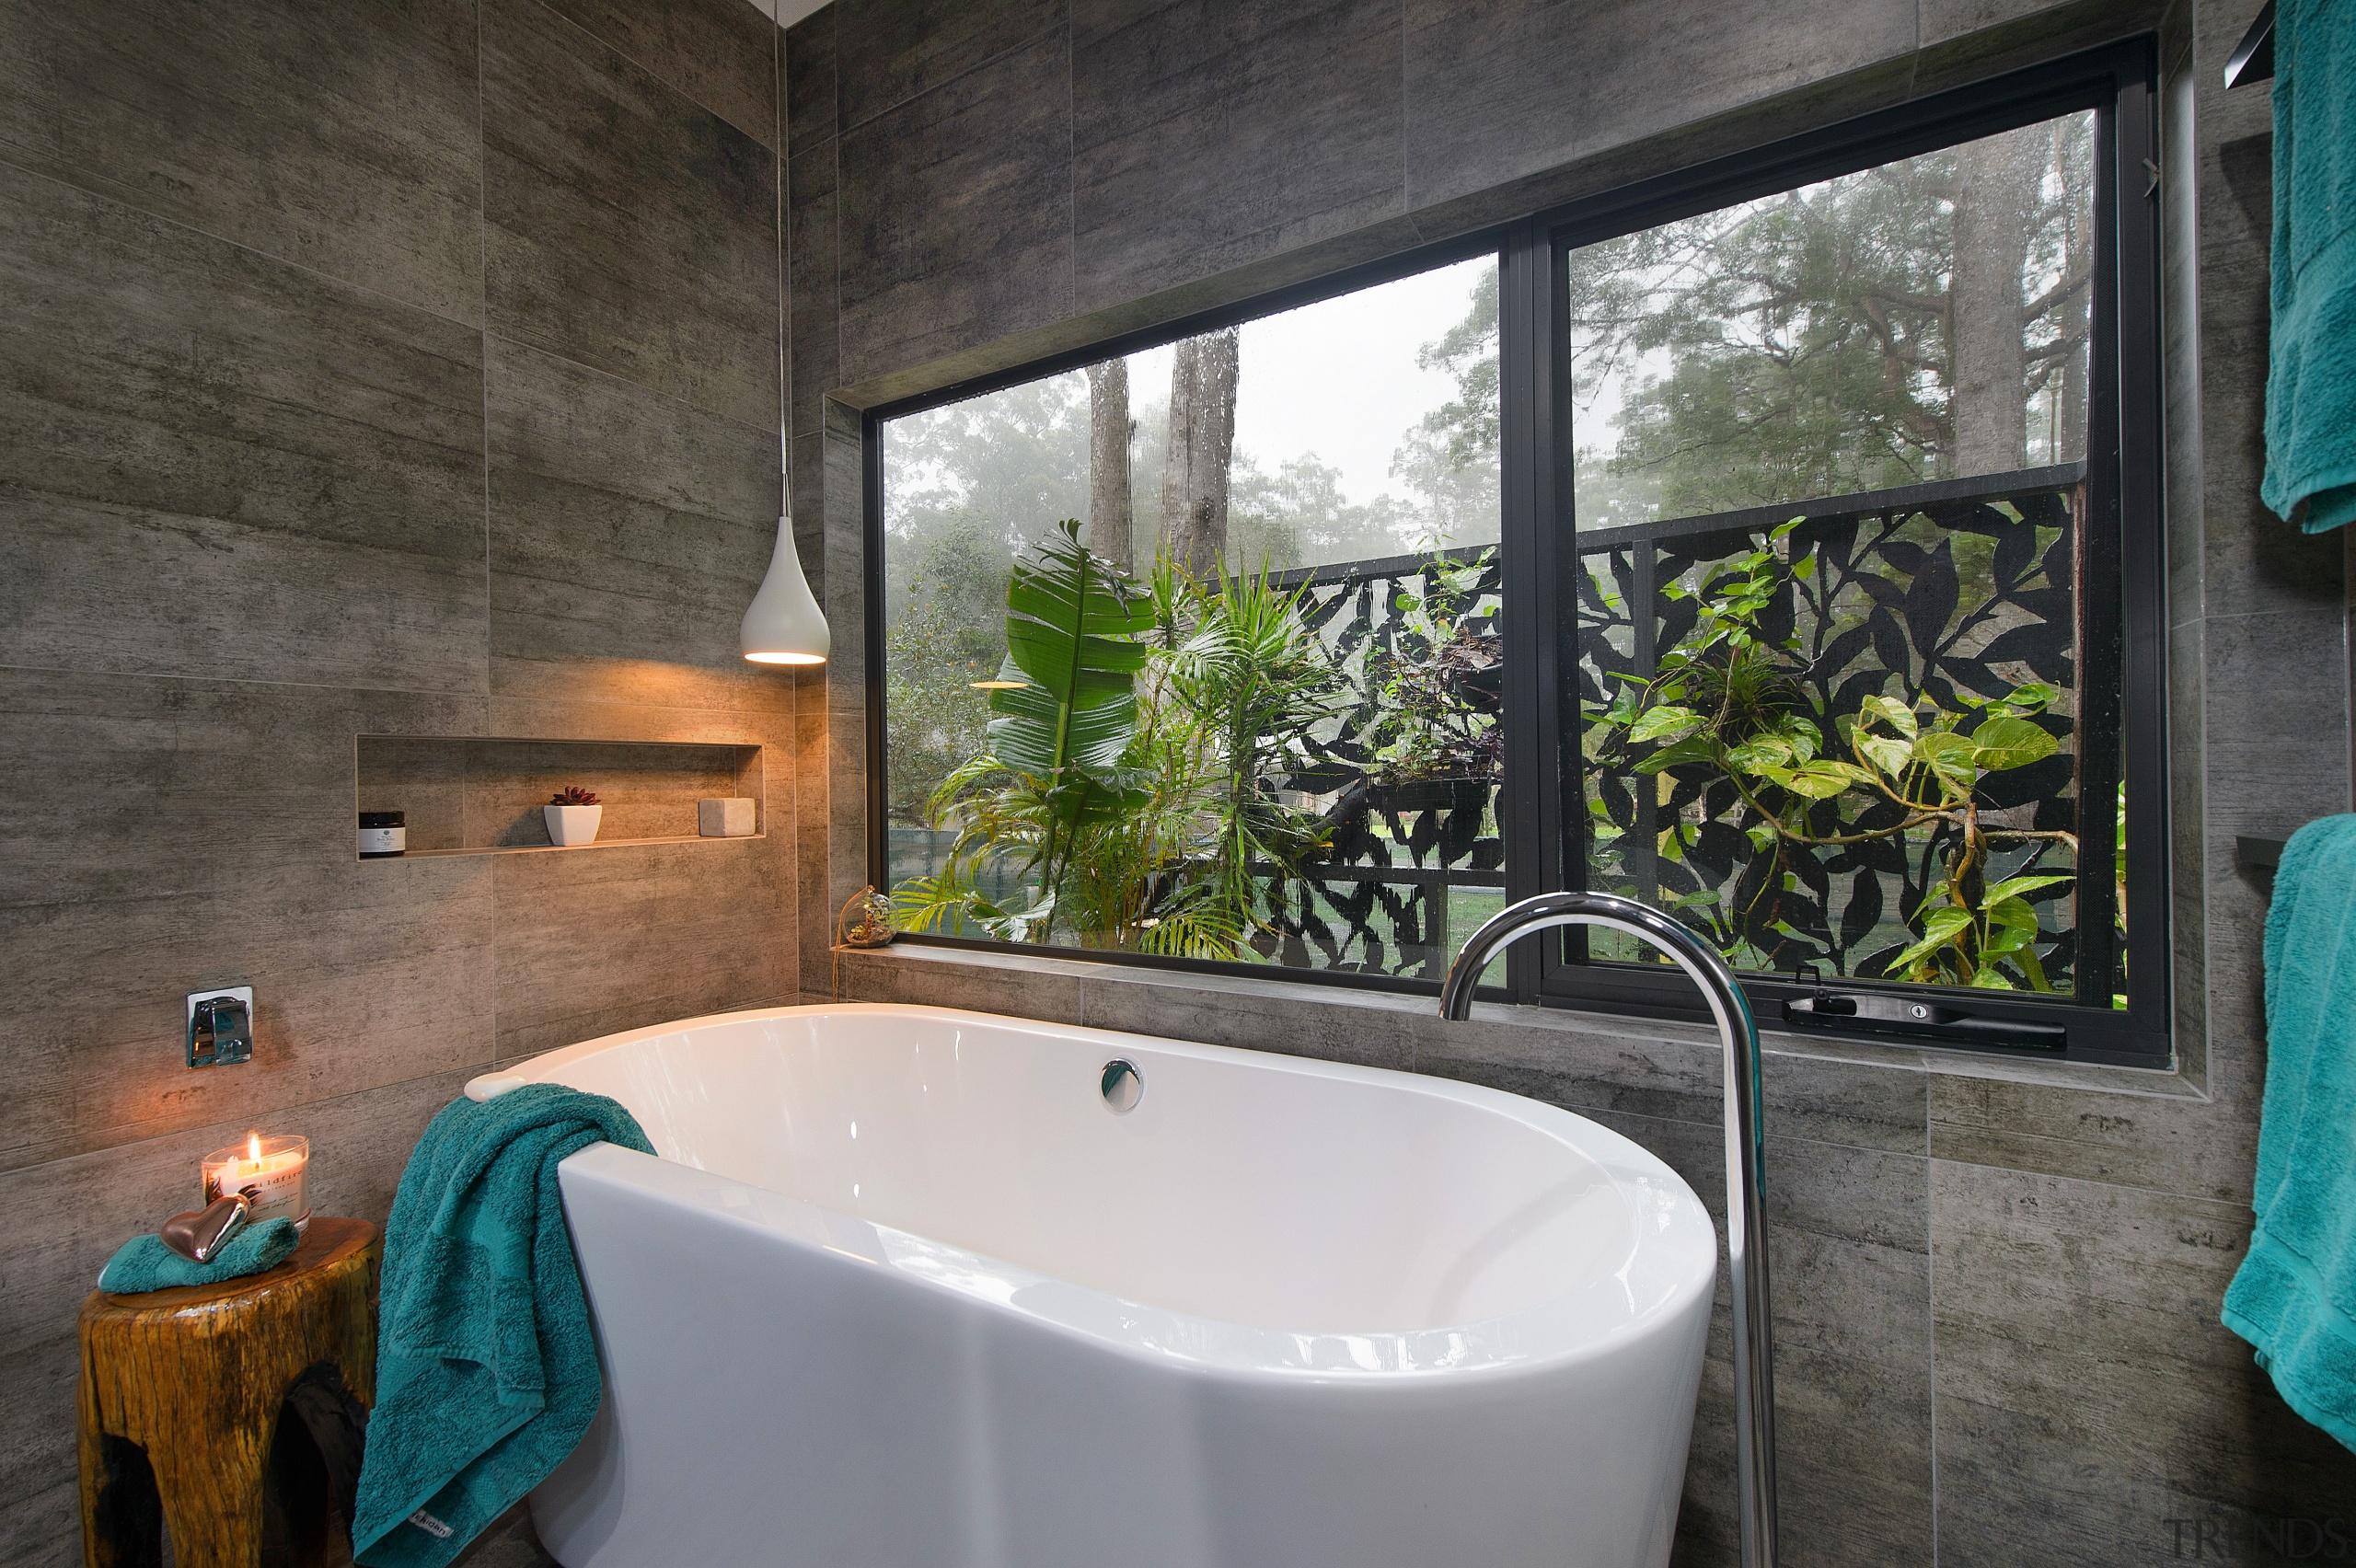 Its a jungle sometimes  the tropical garden architecture, bathroom, bathtub, estate, home, house, interior design, property, real estate, room, window, black, gray